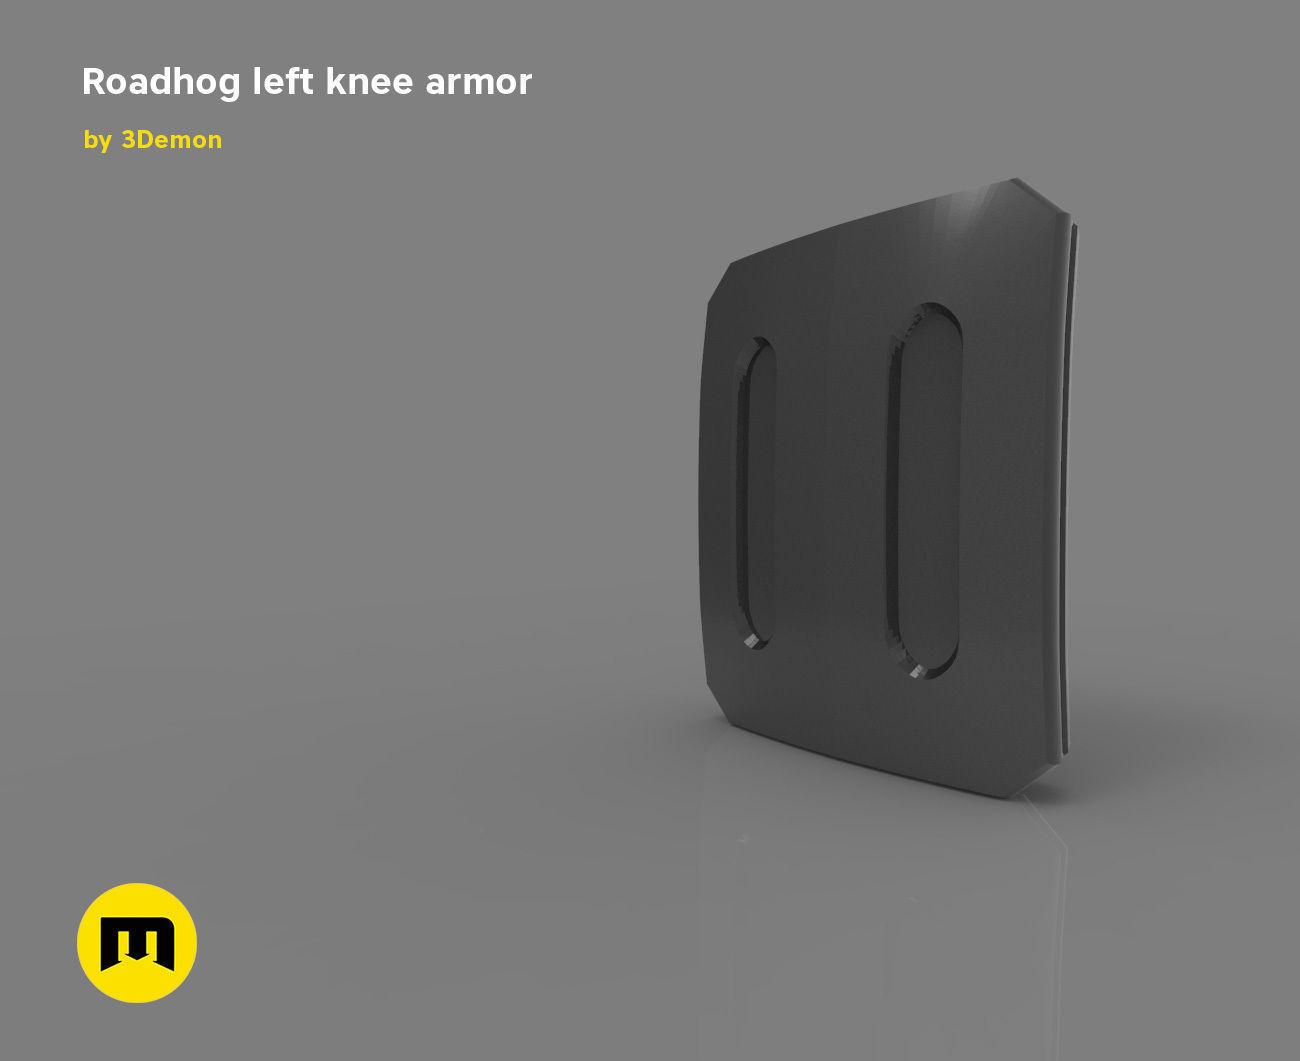 Roadhog left knee armor